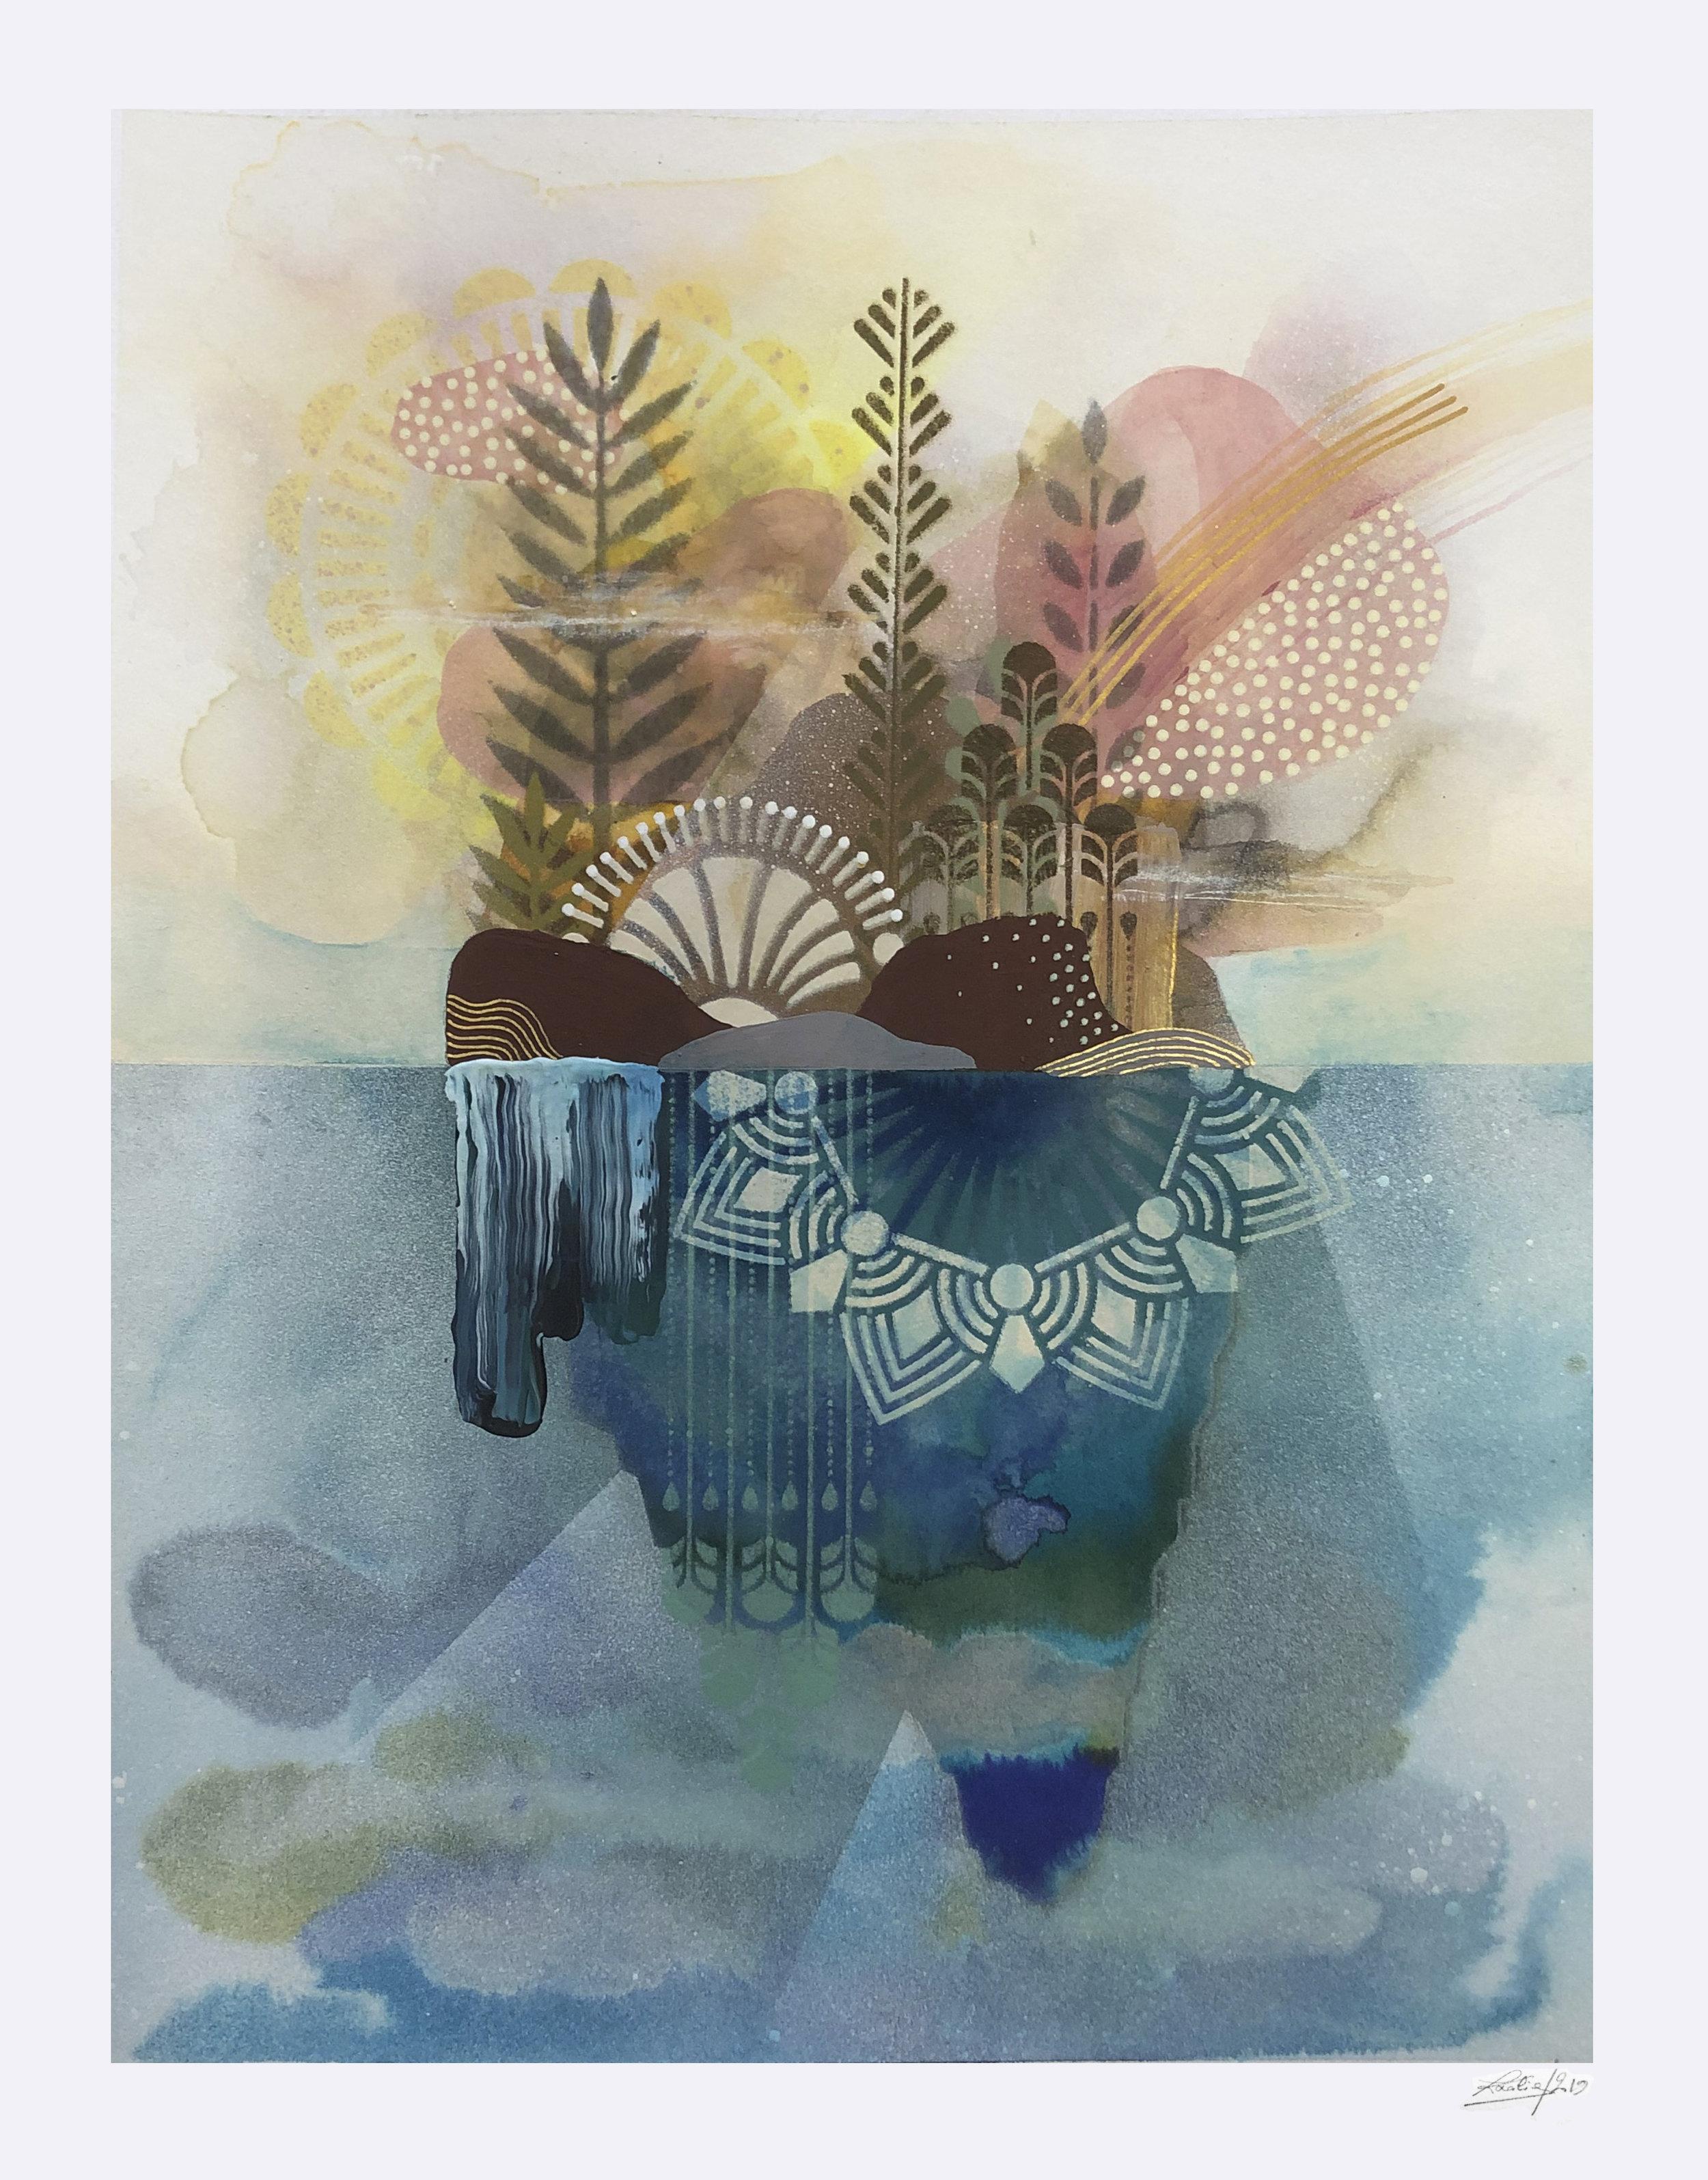 ardin Flottant #6  - Mix media on paper - 36 x46 cm | 2019